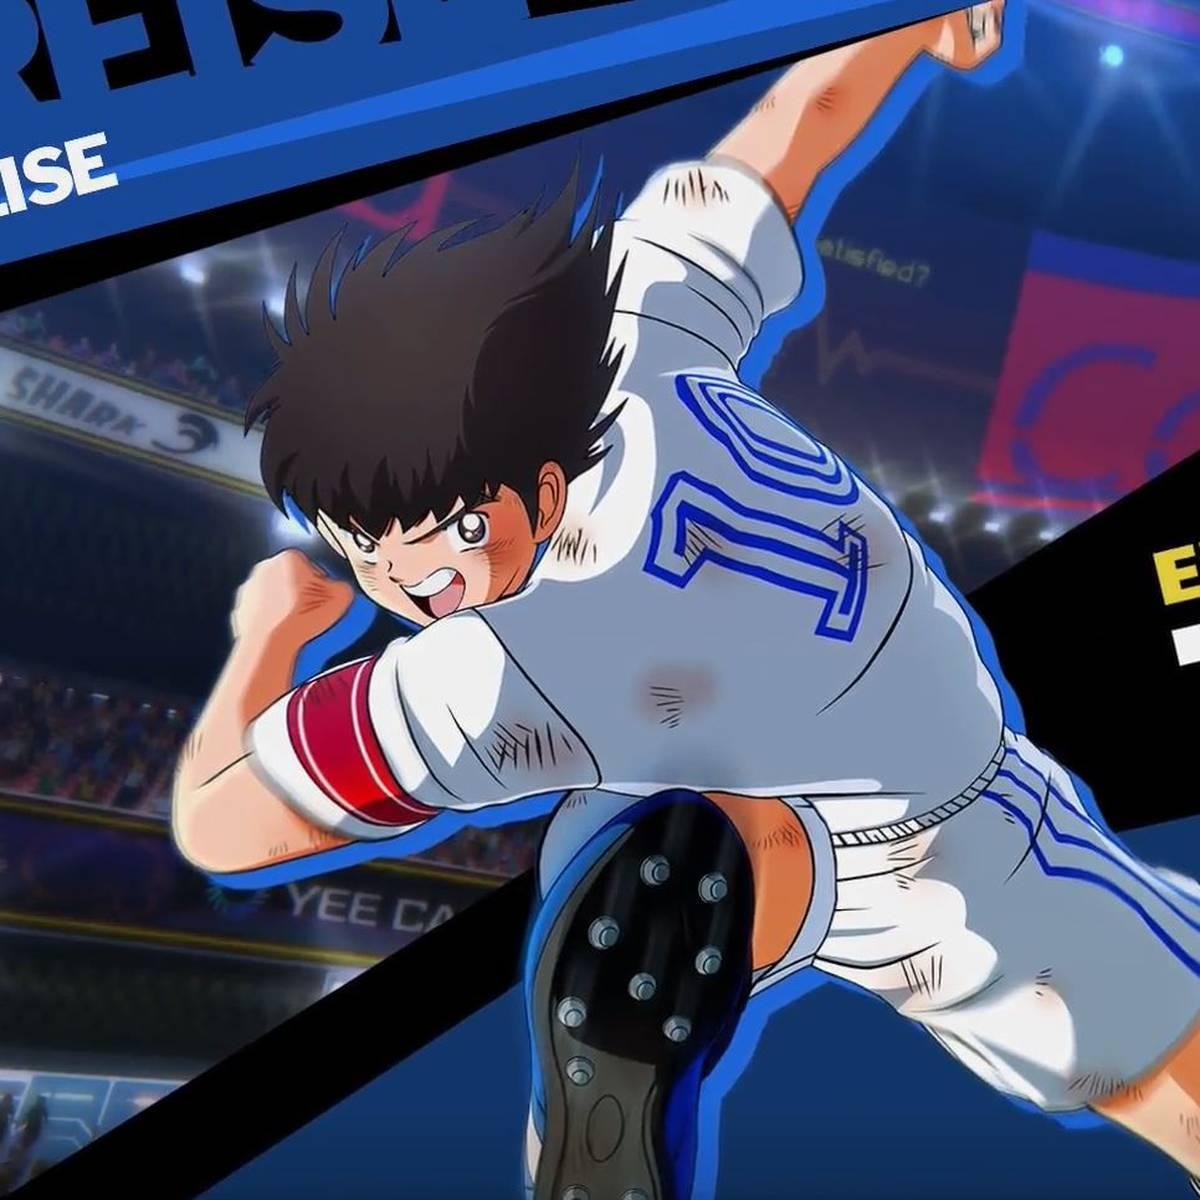 Er ist zurück! Captain Tsubasa feiert sein Comeback